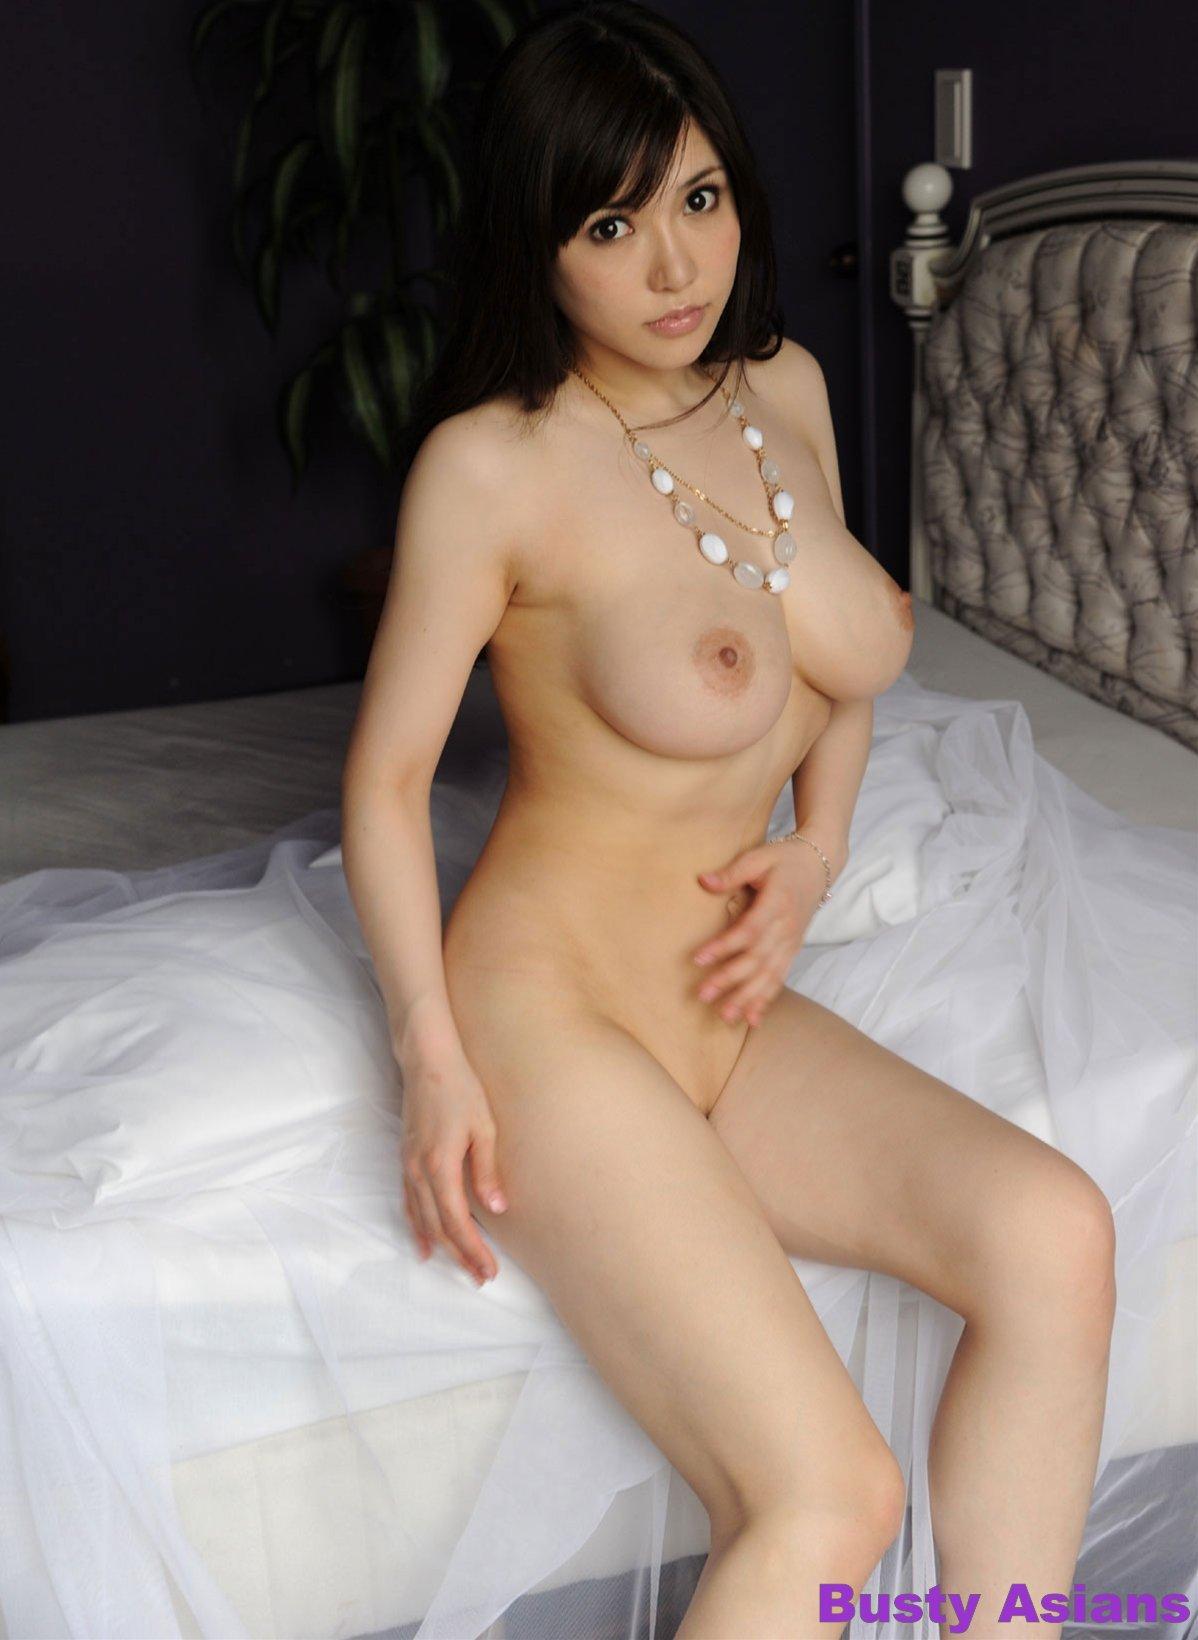 Black porn star mia peach